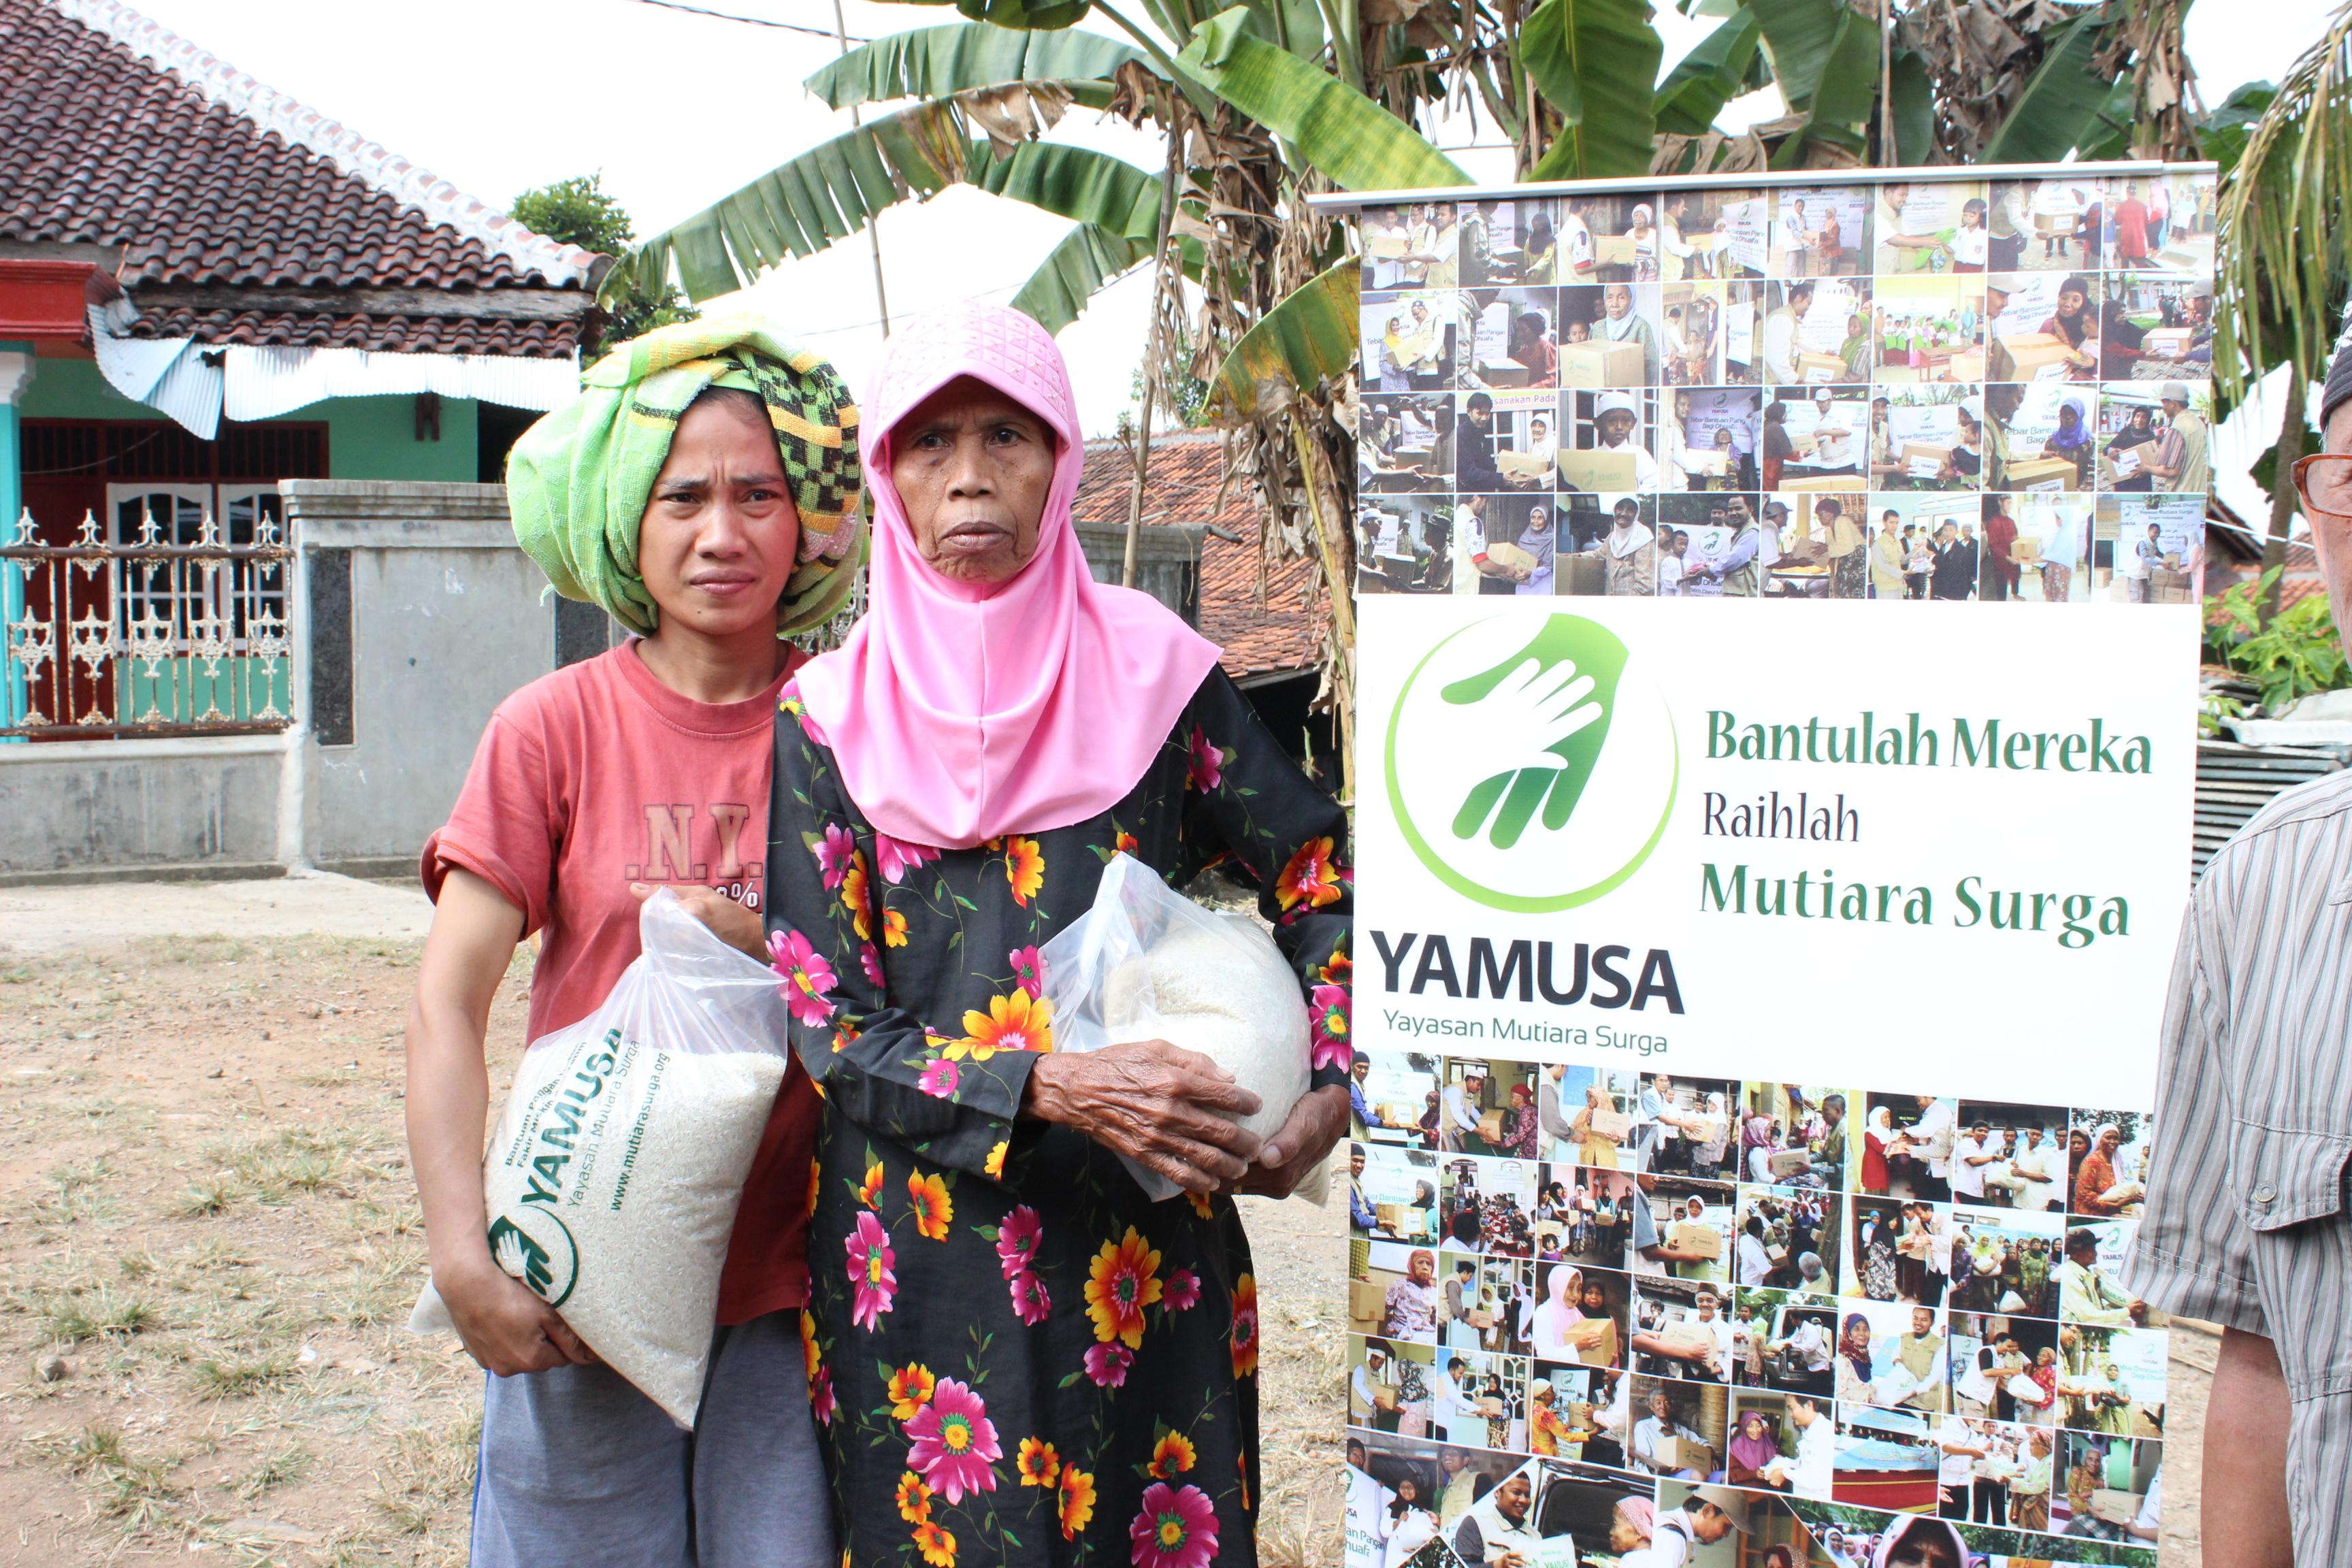 Kp. Cikadu, Desa Rabak, Kecamatan Rumpin, Kabupaten Bogor